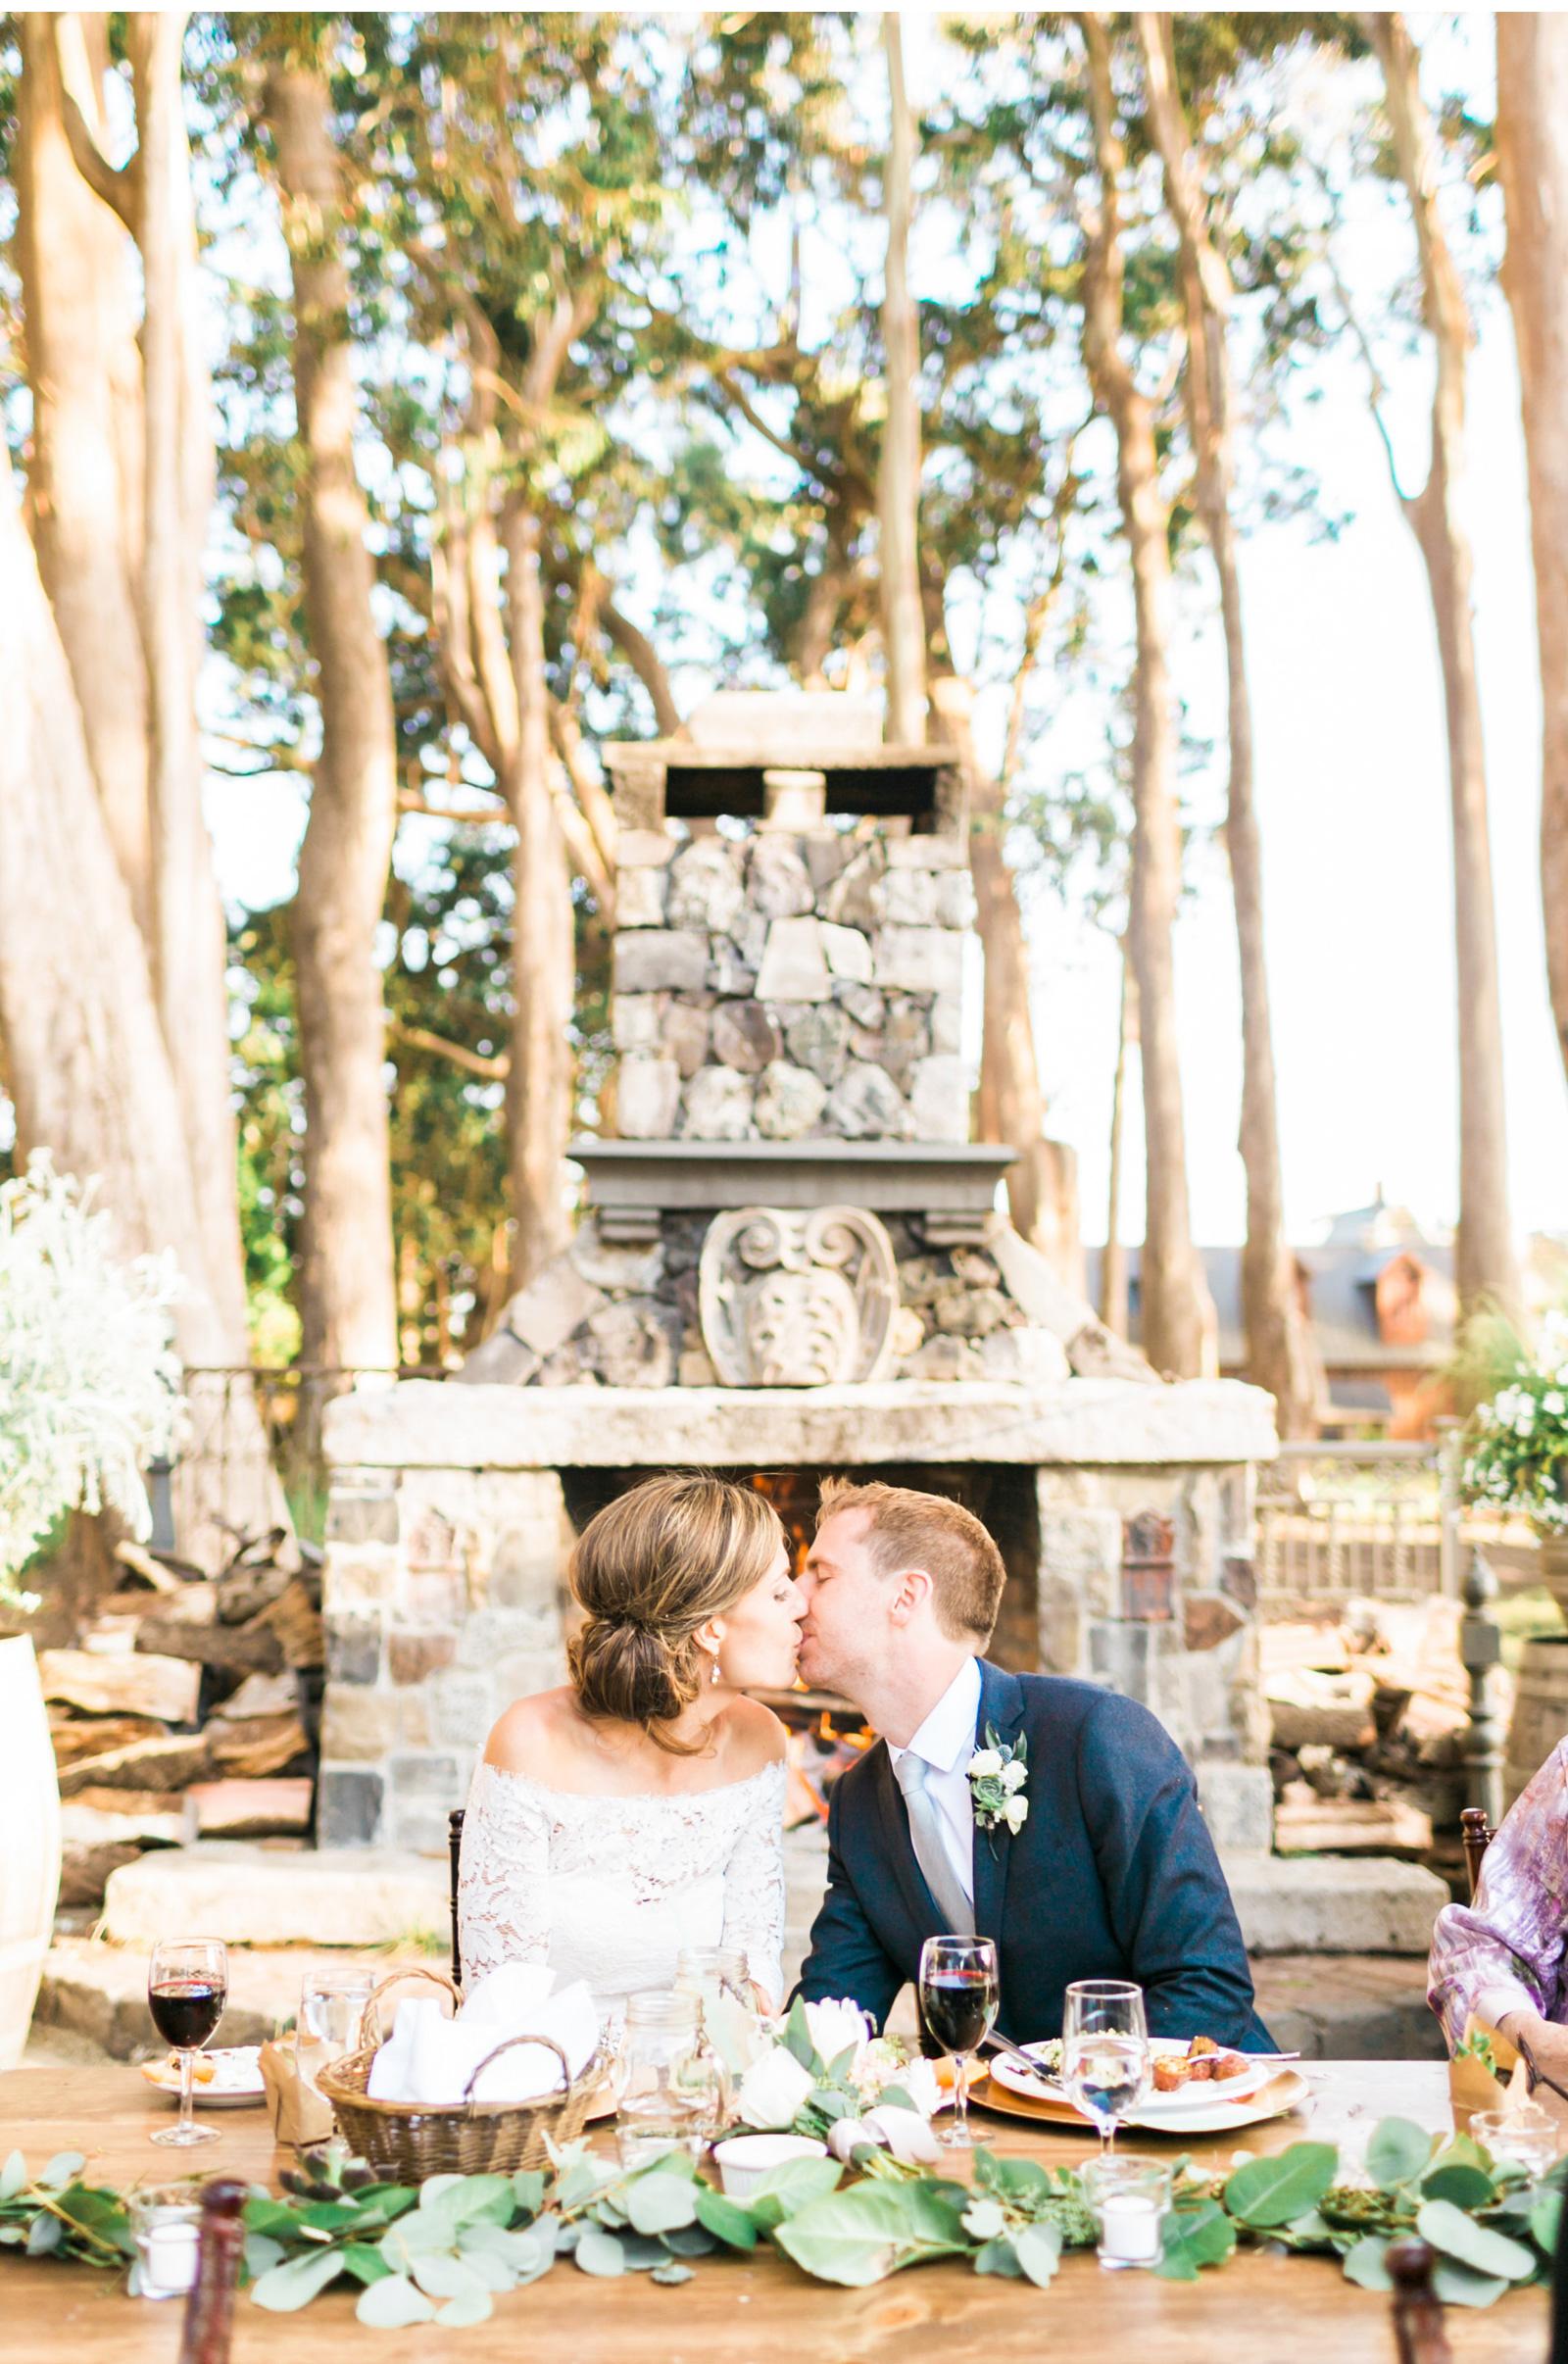 Mendocino-Wedding-Natalie-Schutt-Photography_06.jpg